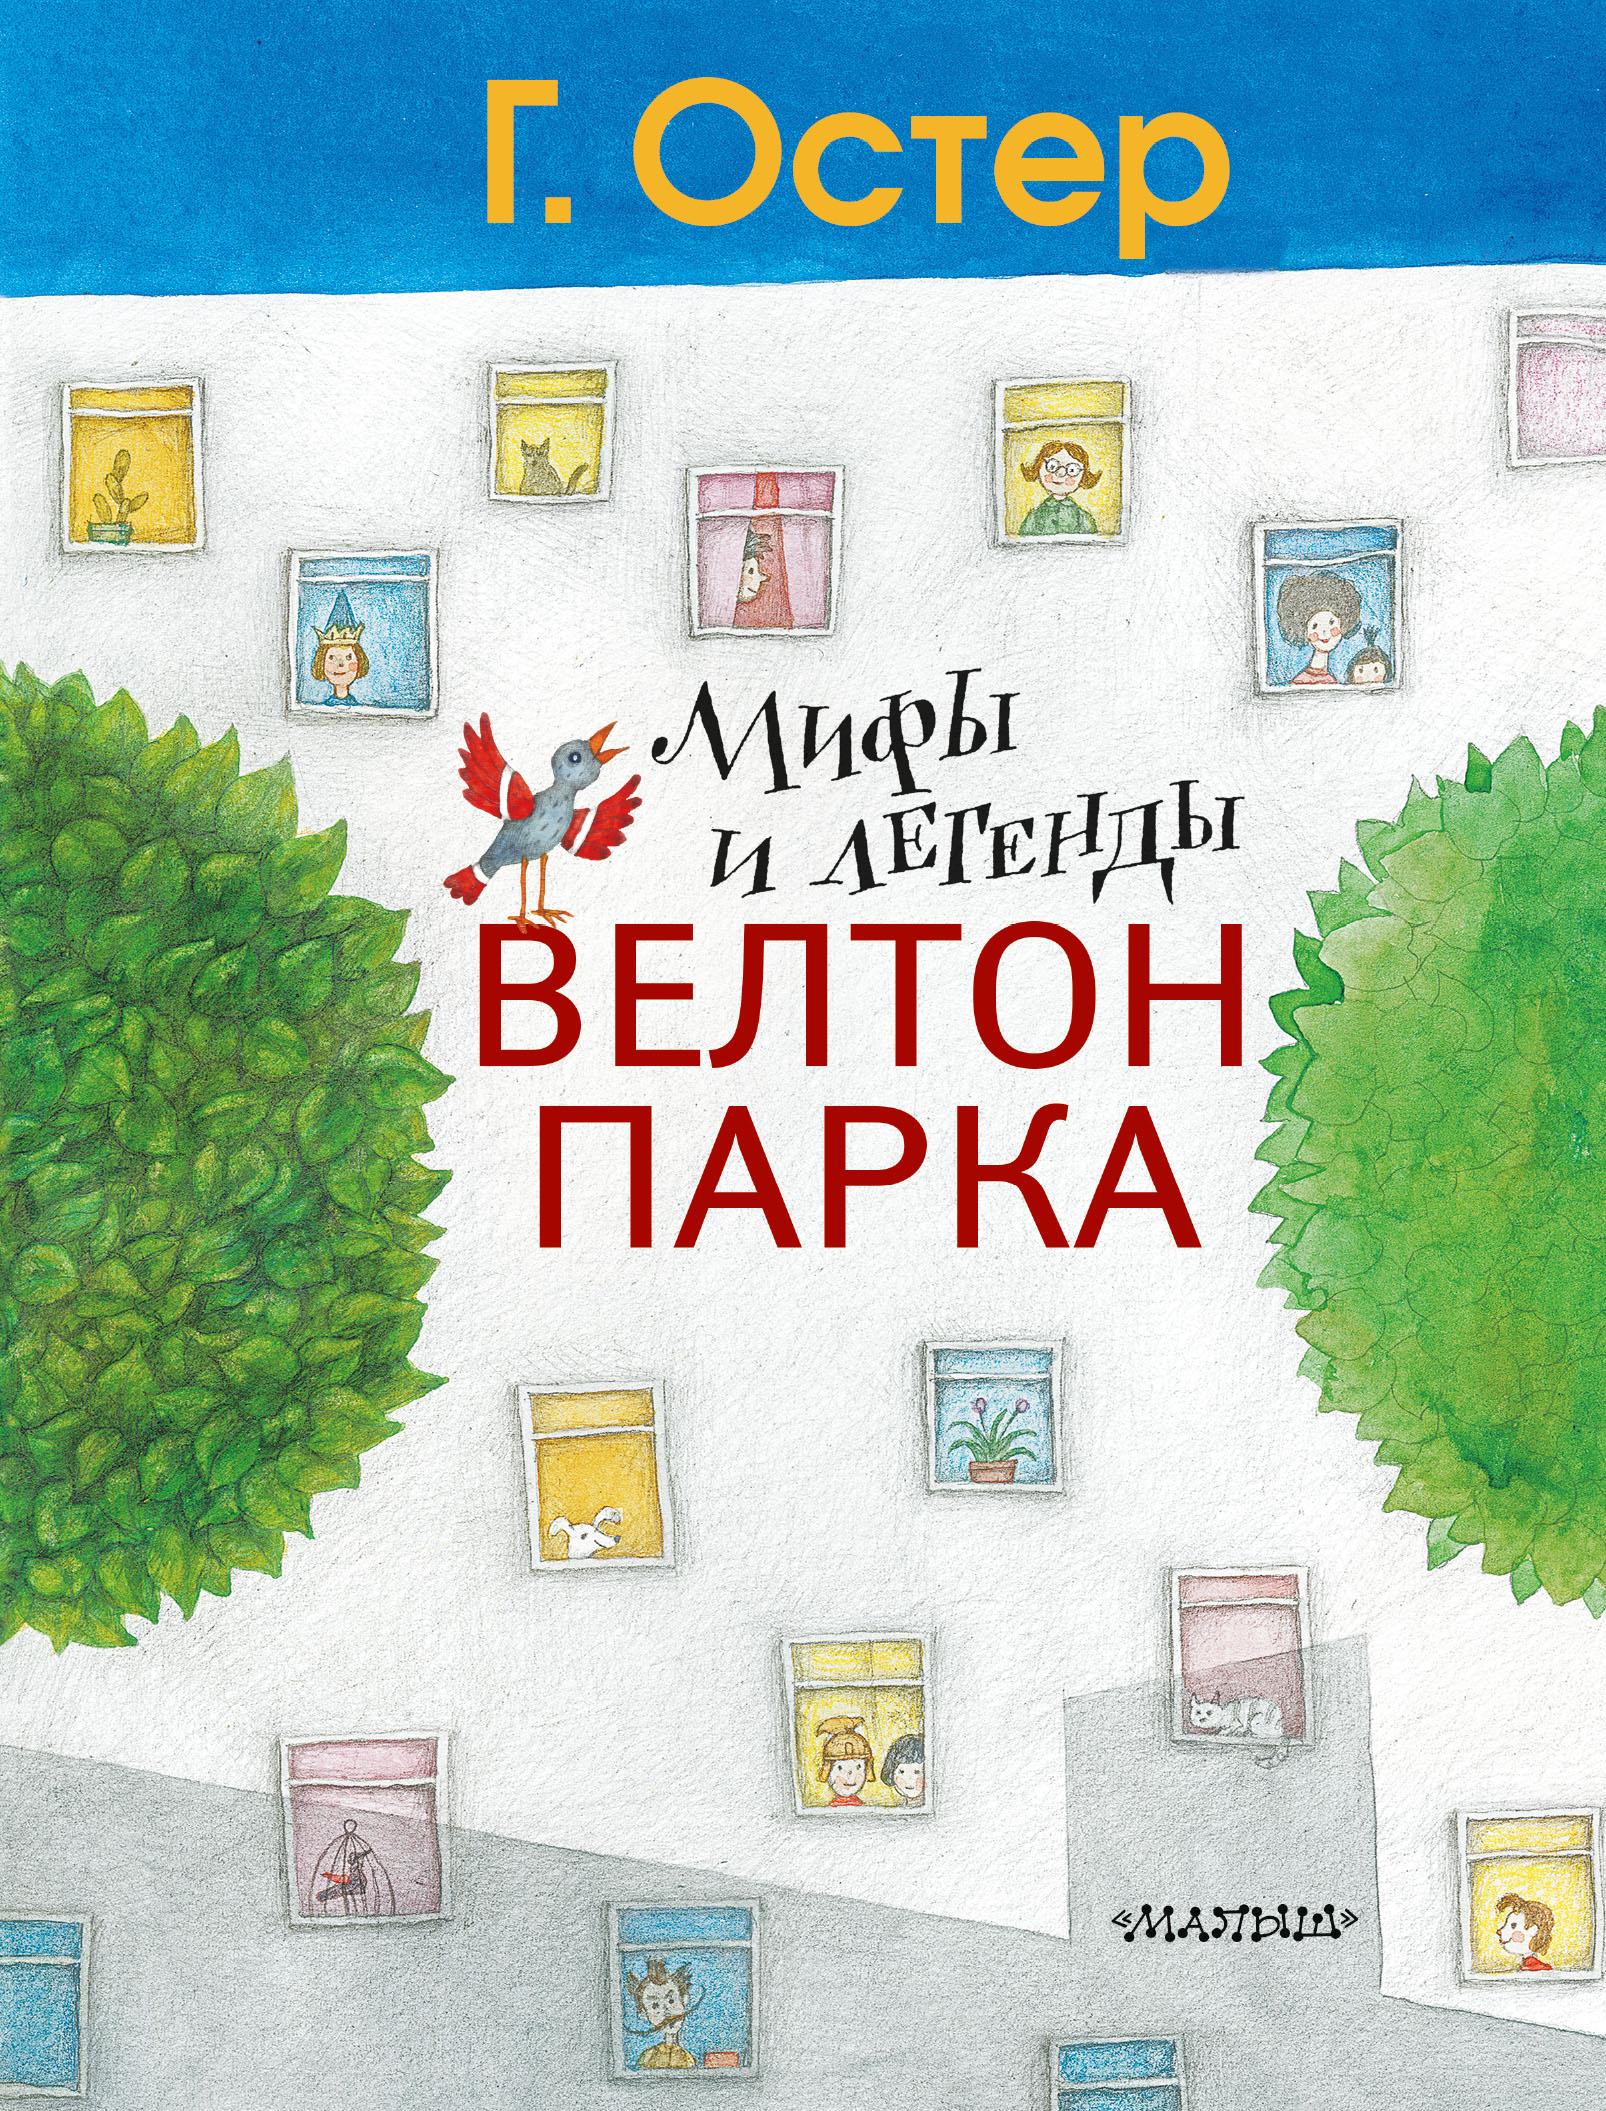 Остер Г.Б. Мифы и легенды Велтон-парка